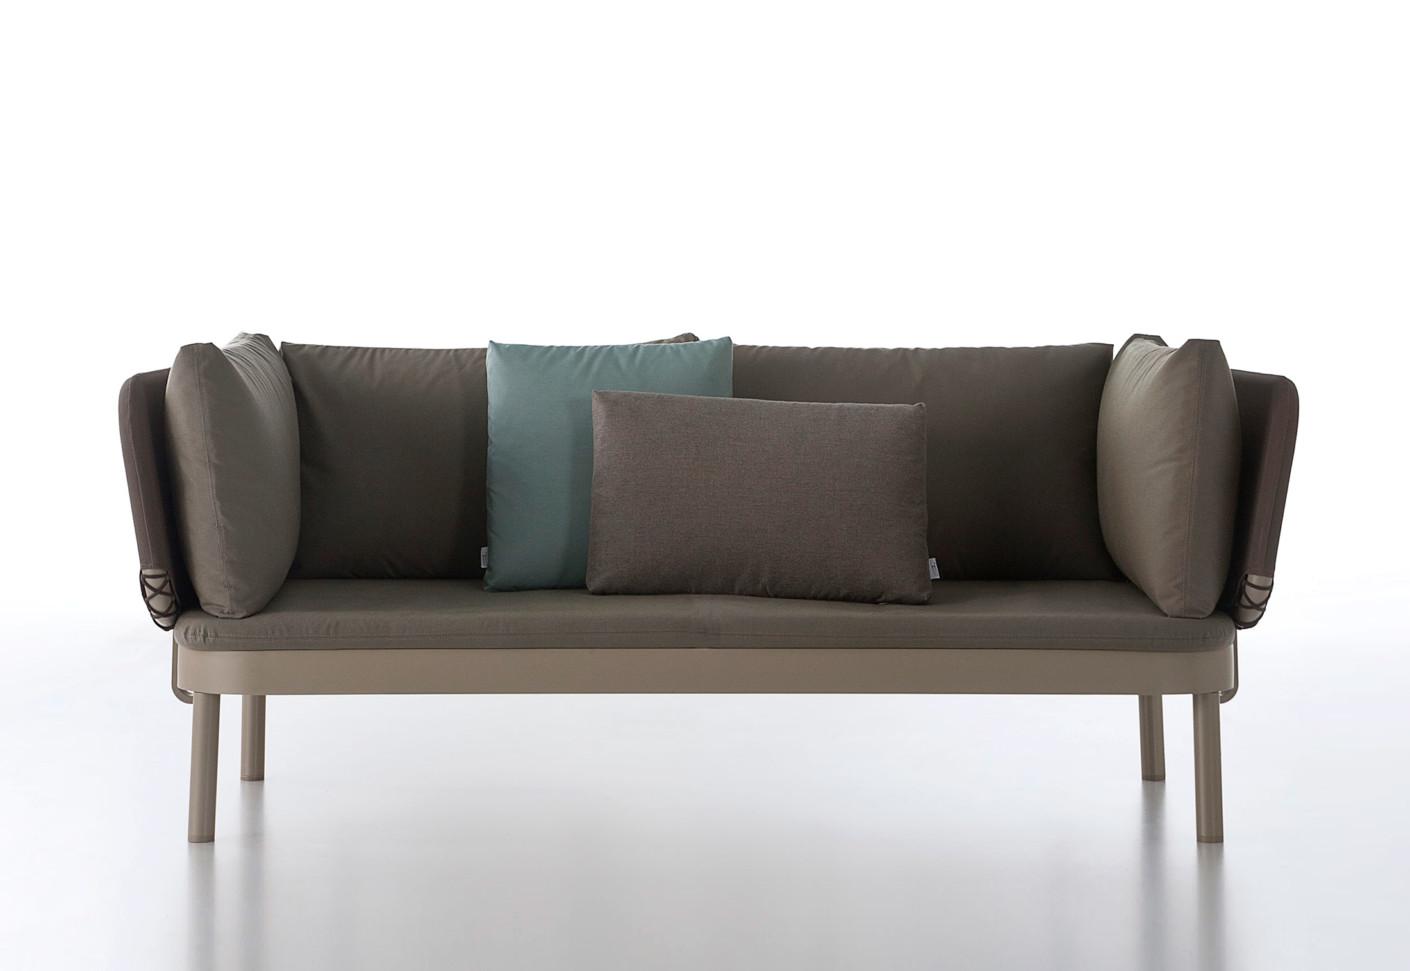 gandia blasco clack chair keekaroo high parts tropez sofa by stylepark